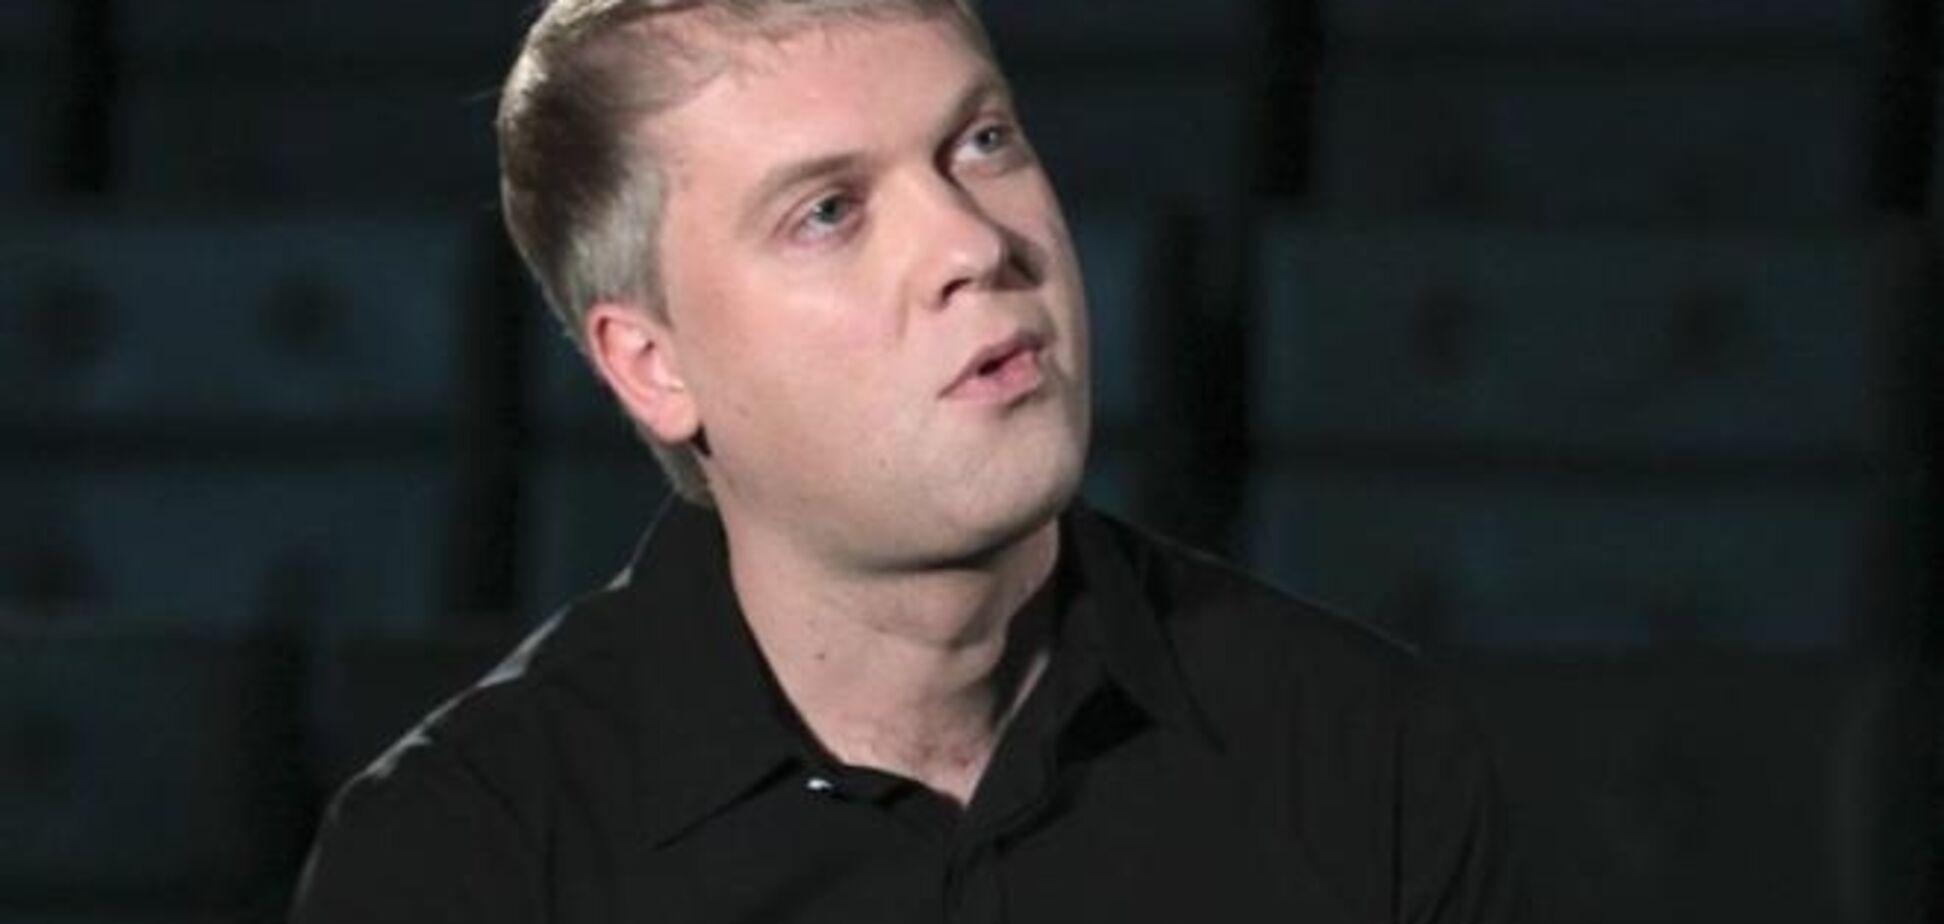 Светлакова застукали за поцелуем с журналисткой Нового канала